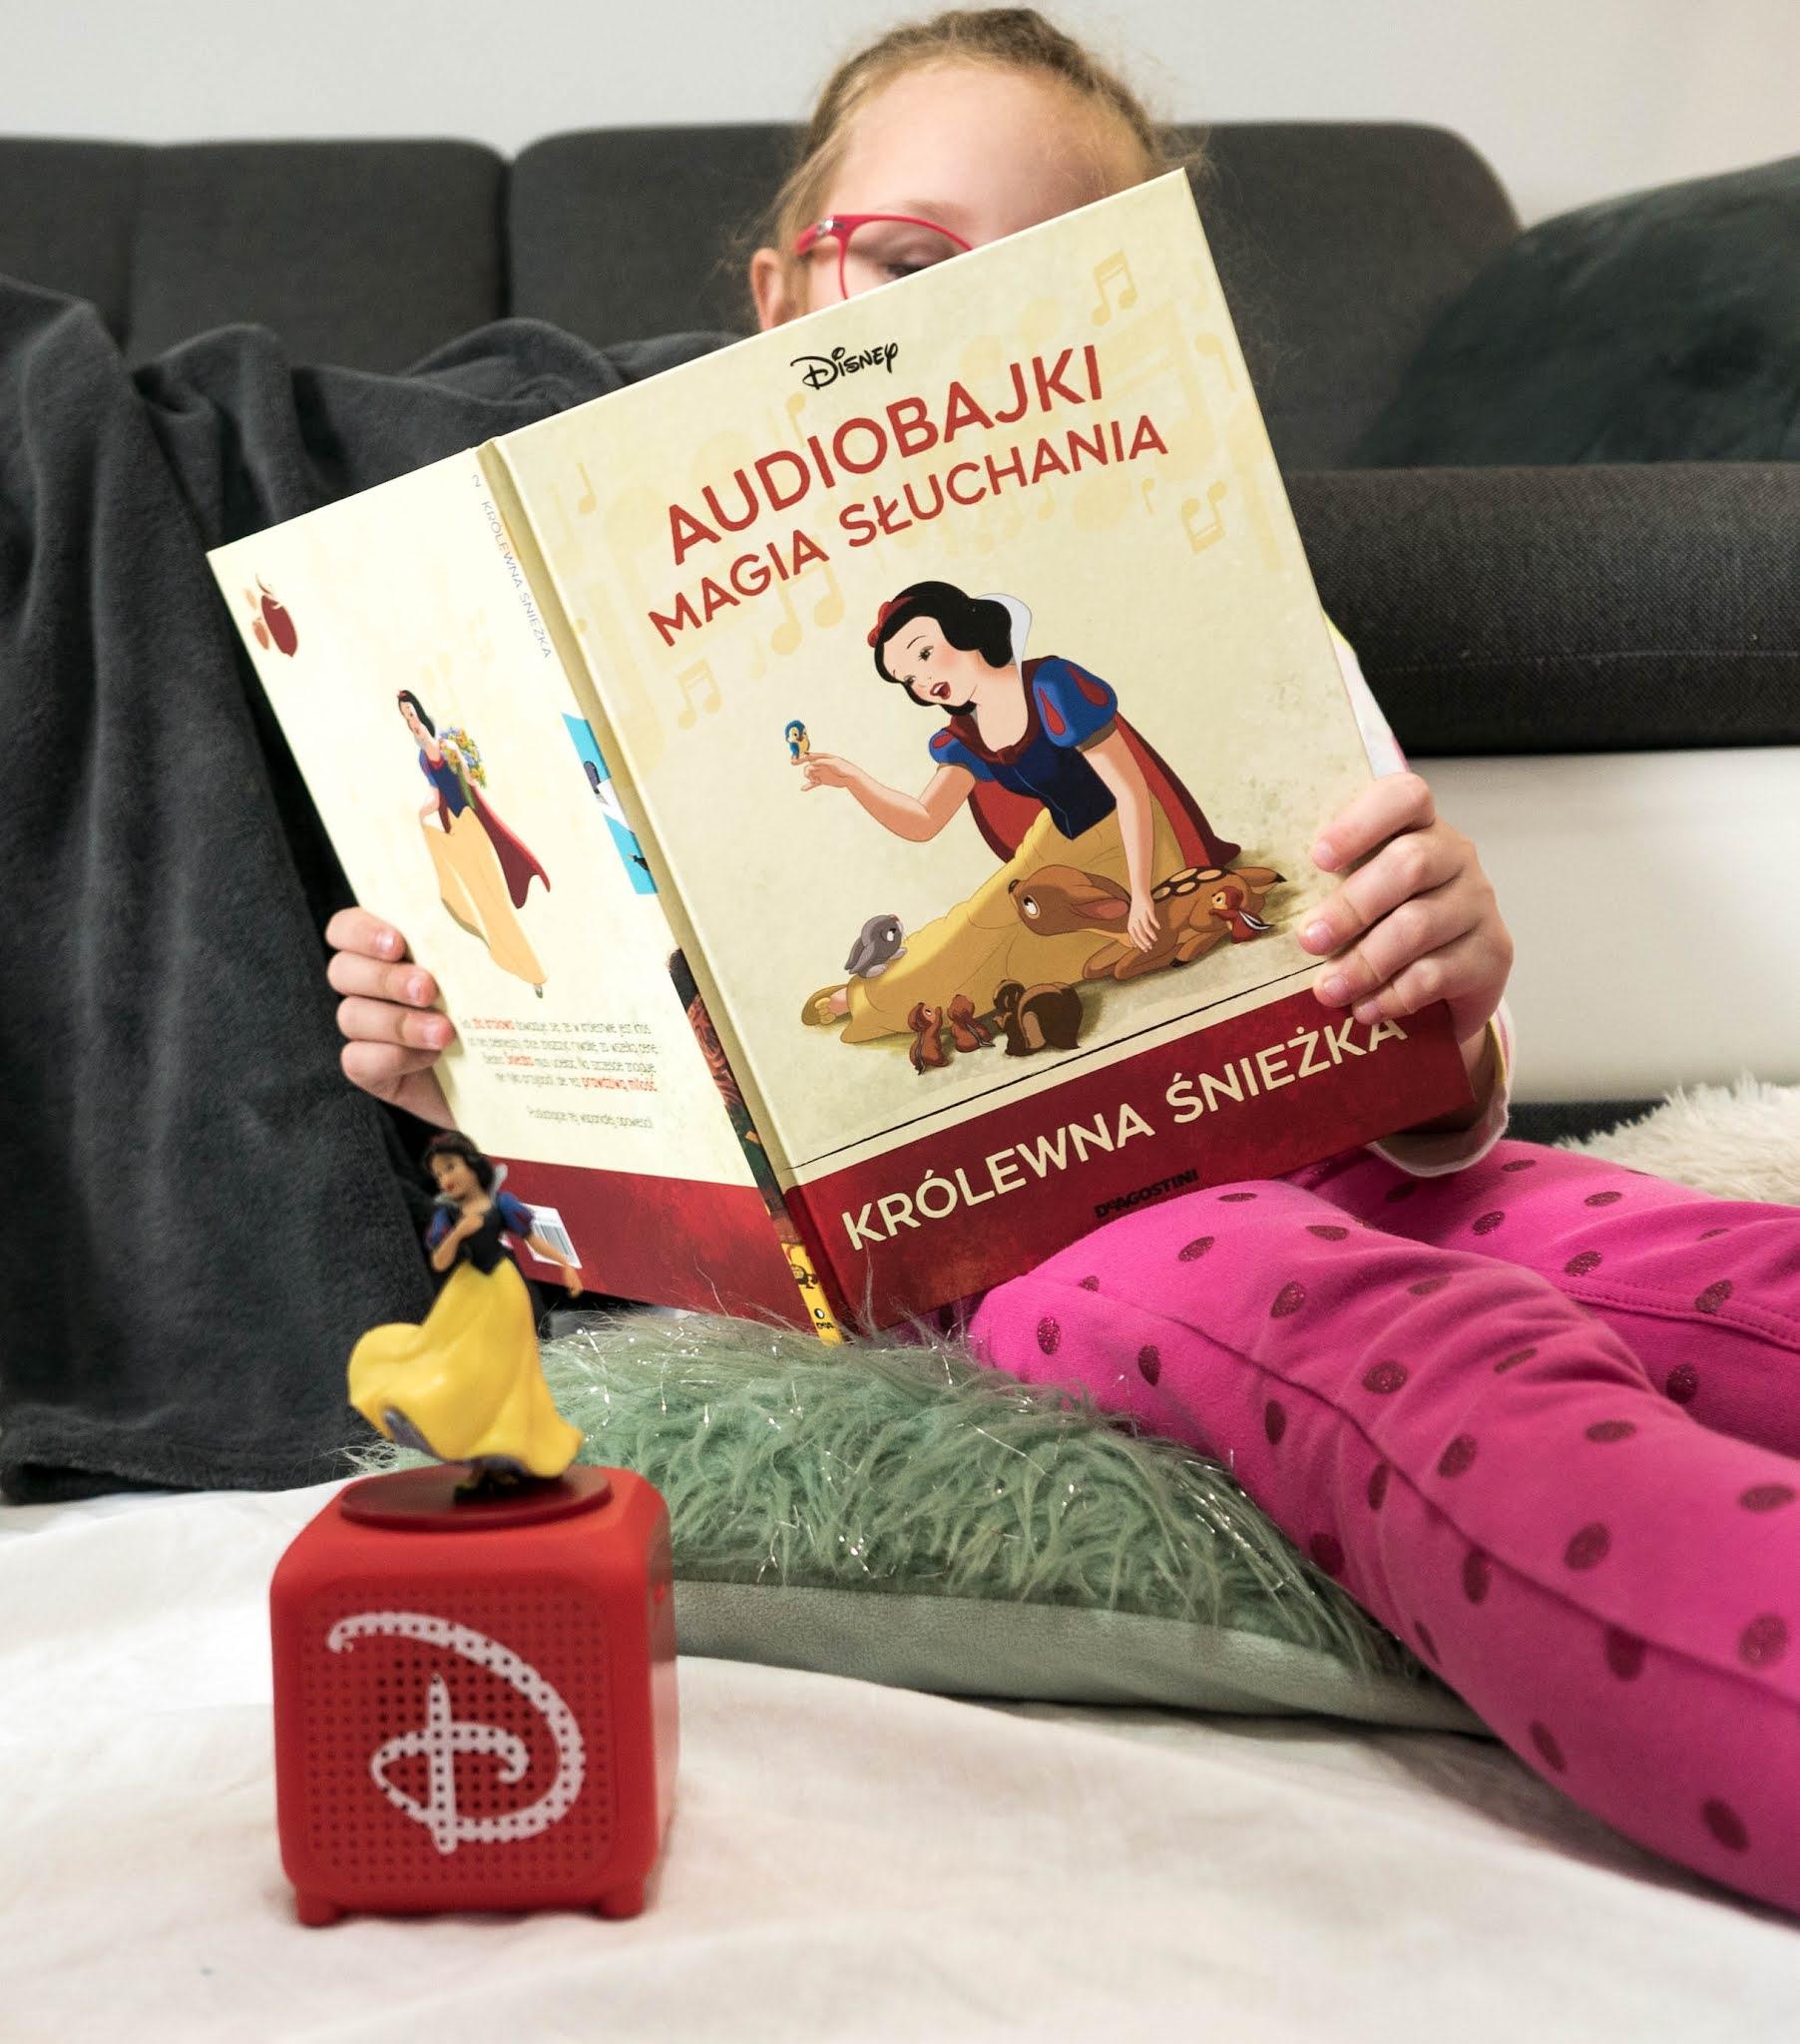 Królewna Snieżka audiobook